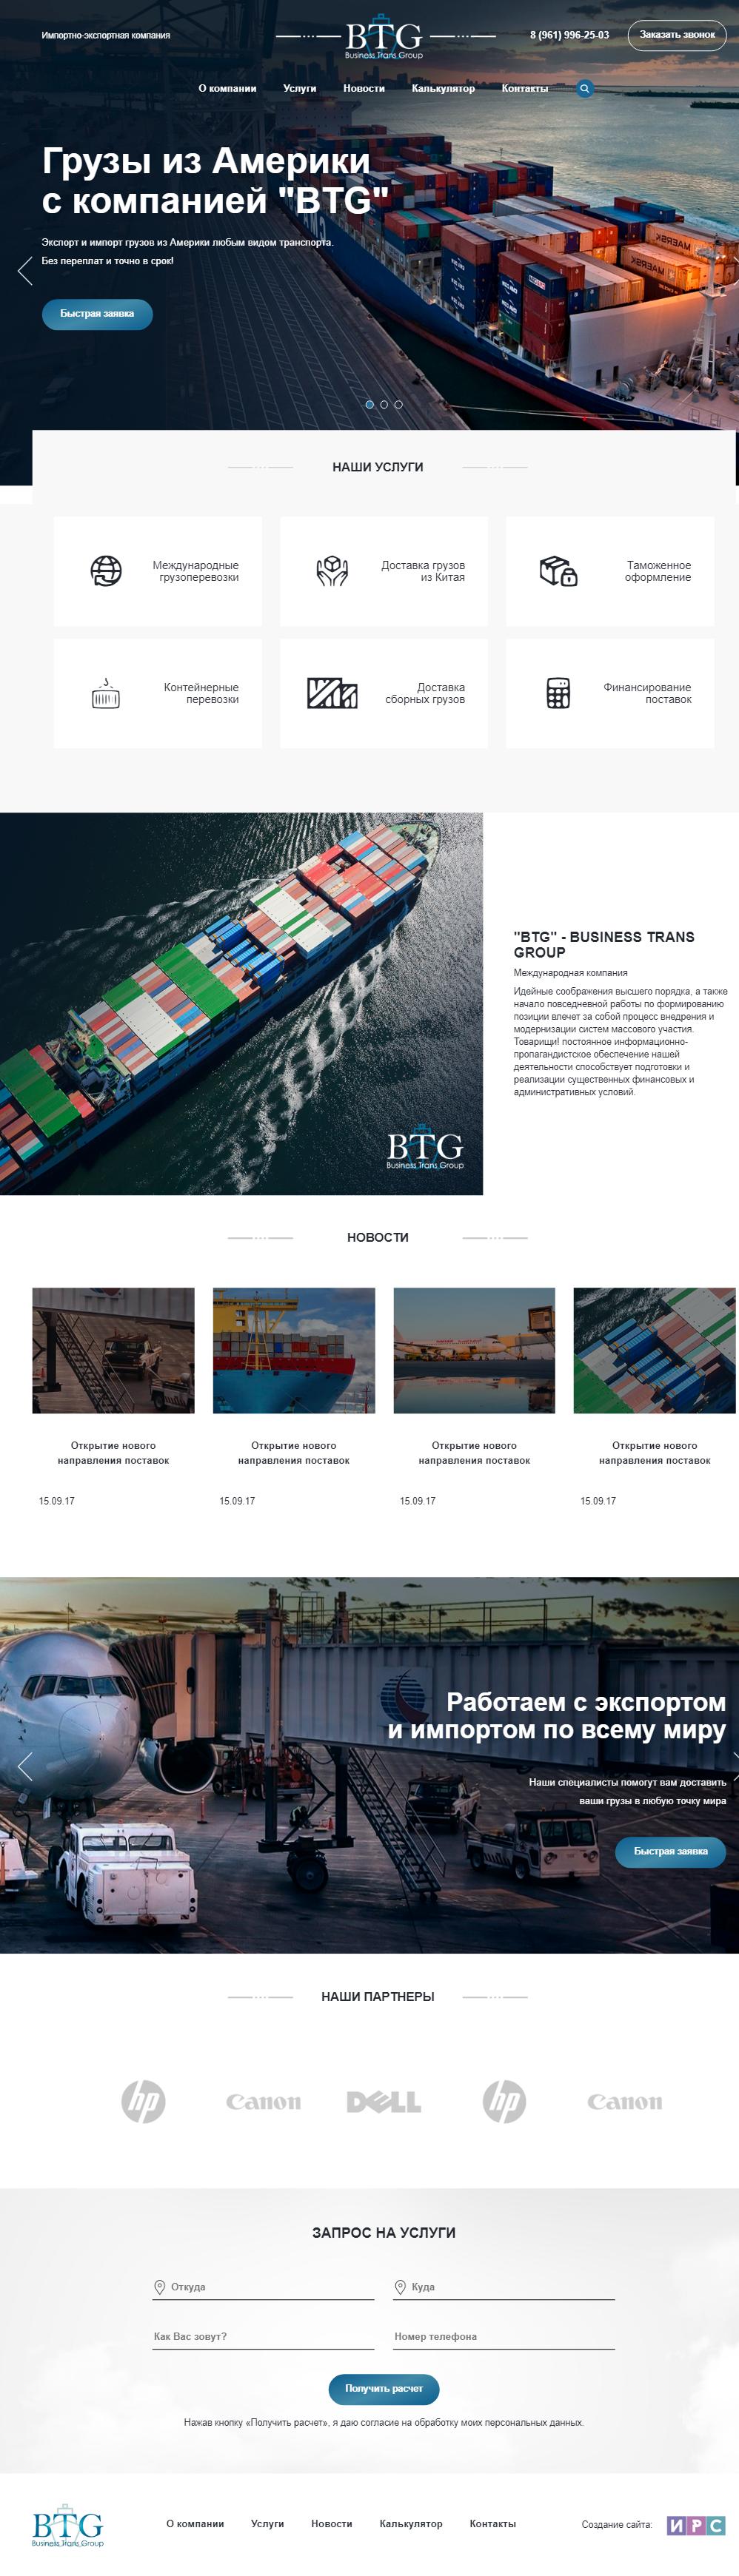 """BTG - Business Trans Group"""